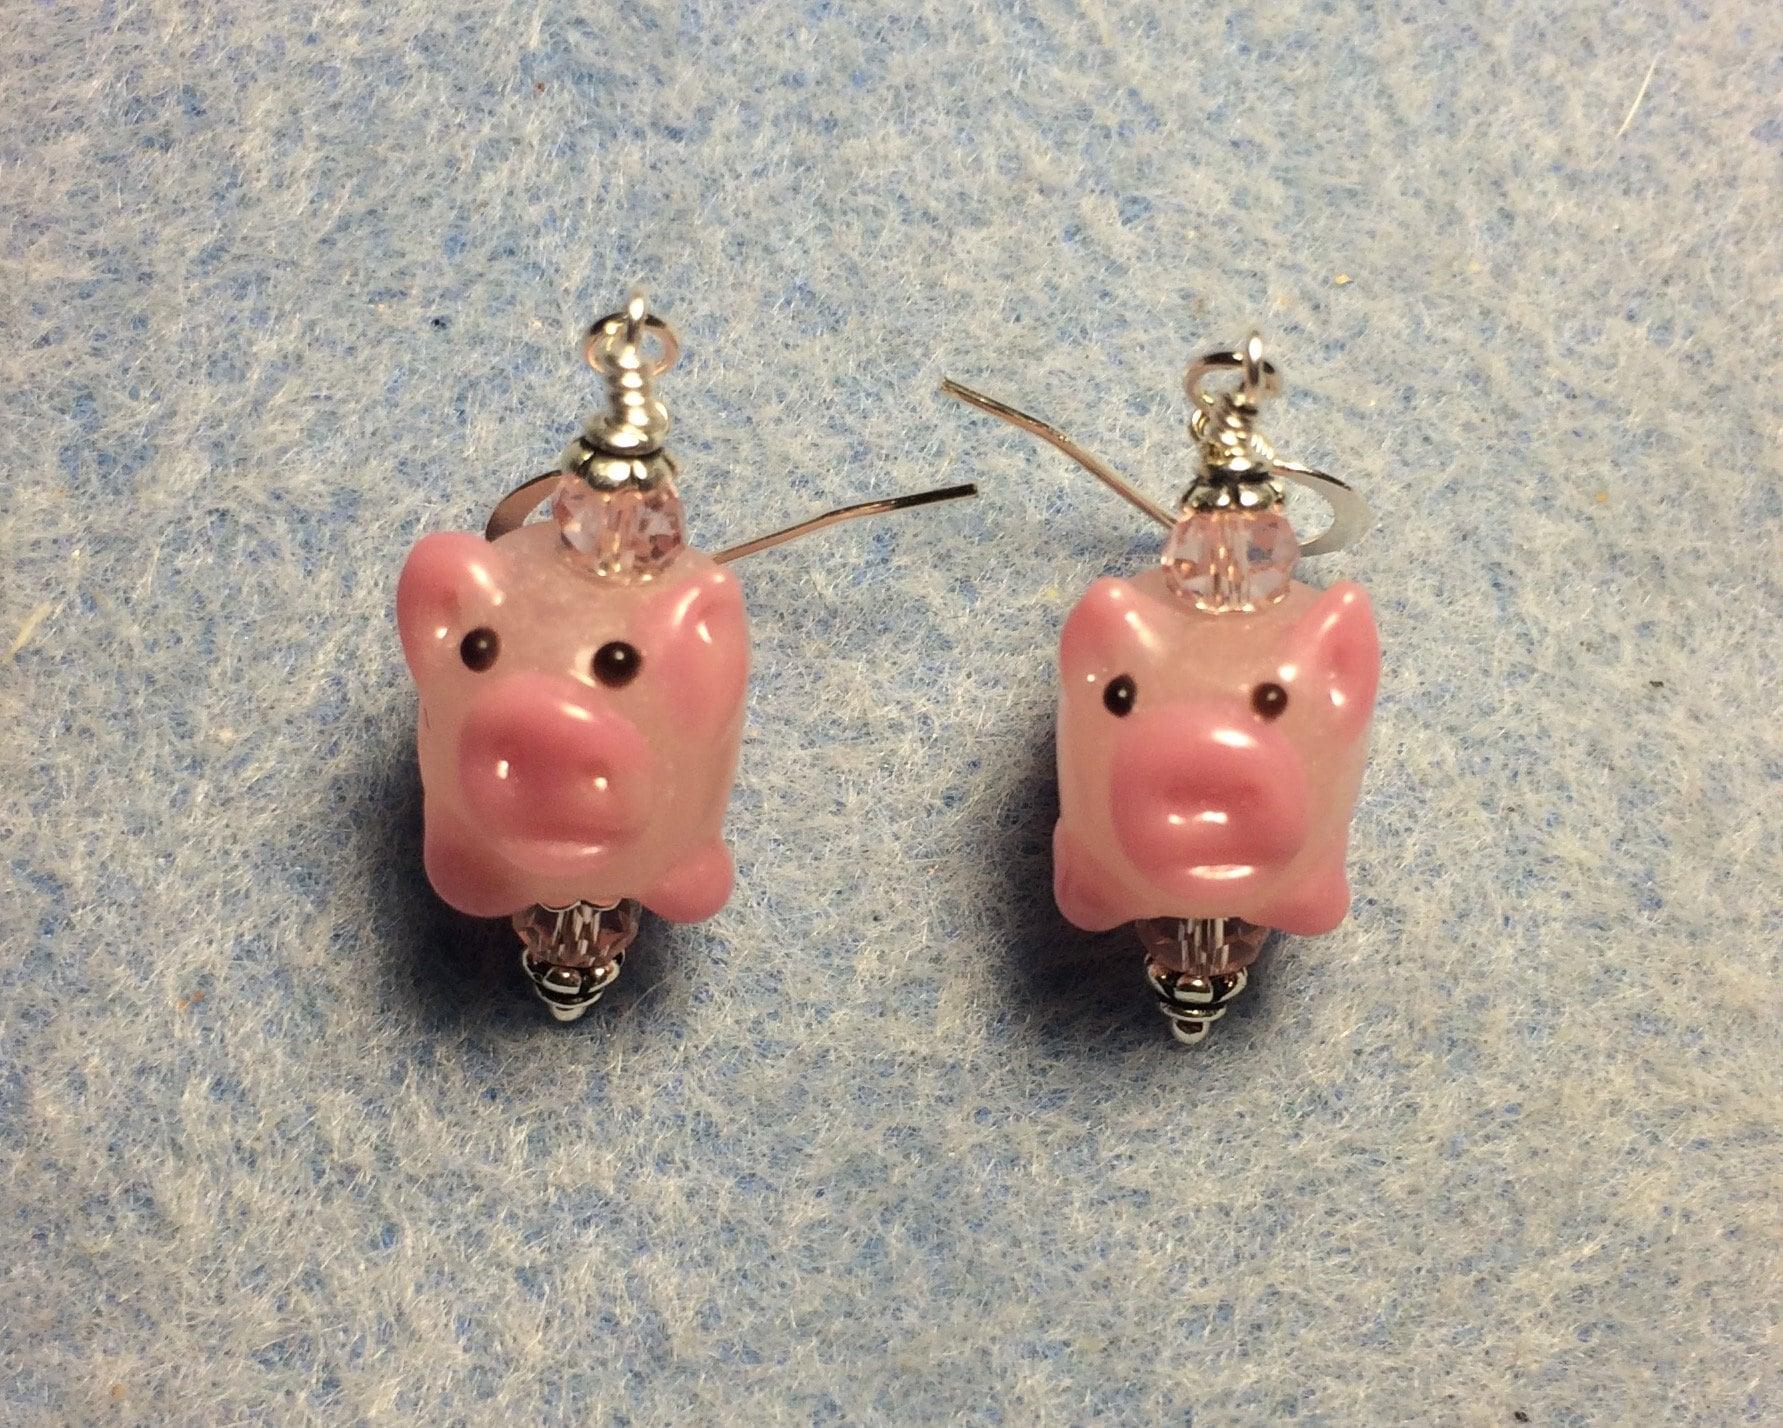 Small red lampwork pig bead earrings adorned with red Czech glass beads. Red lamp work pig earrings